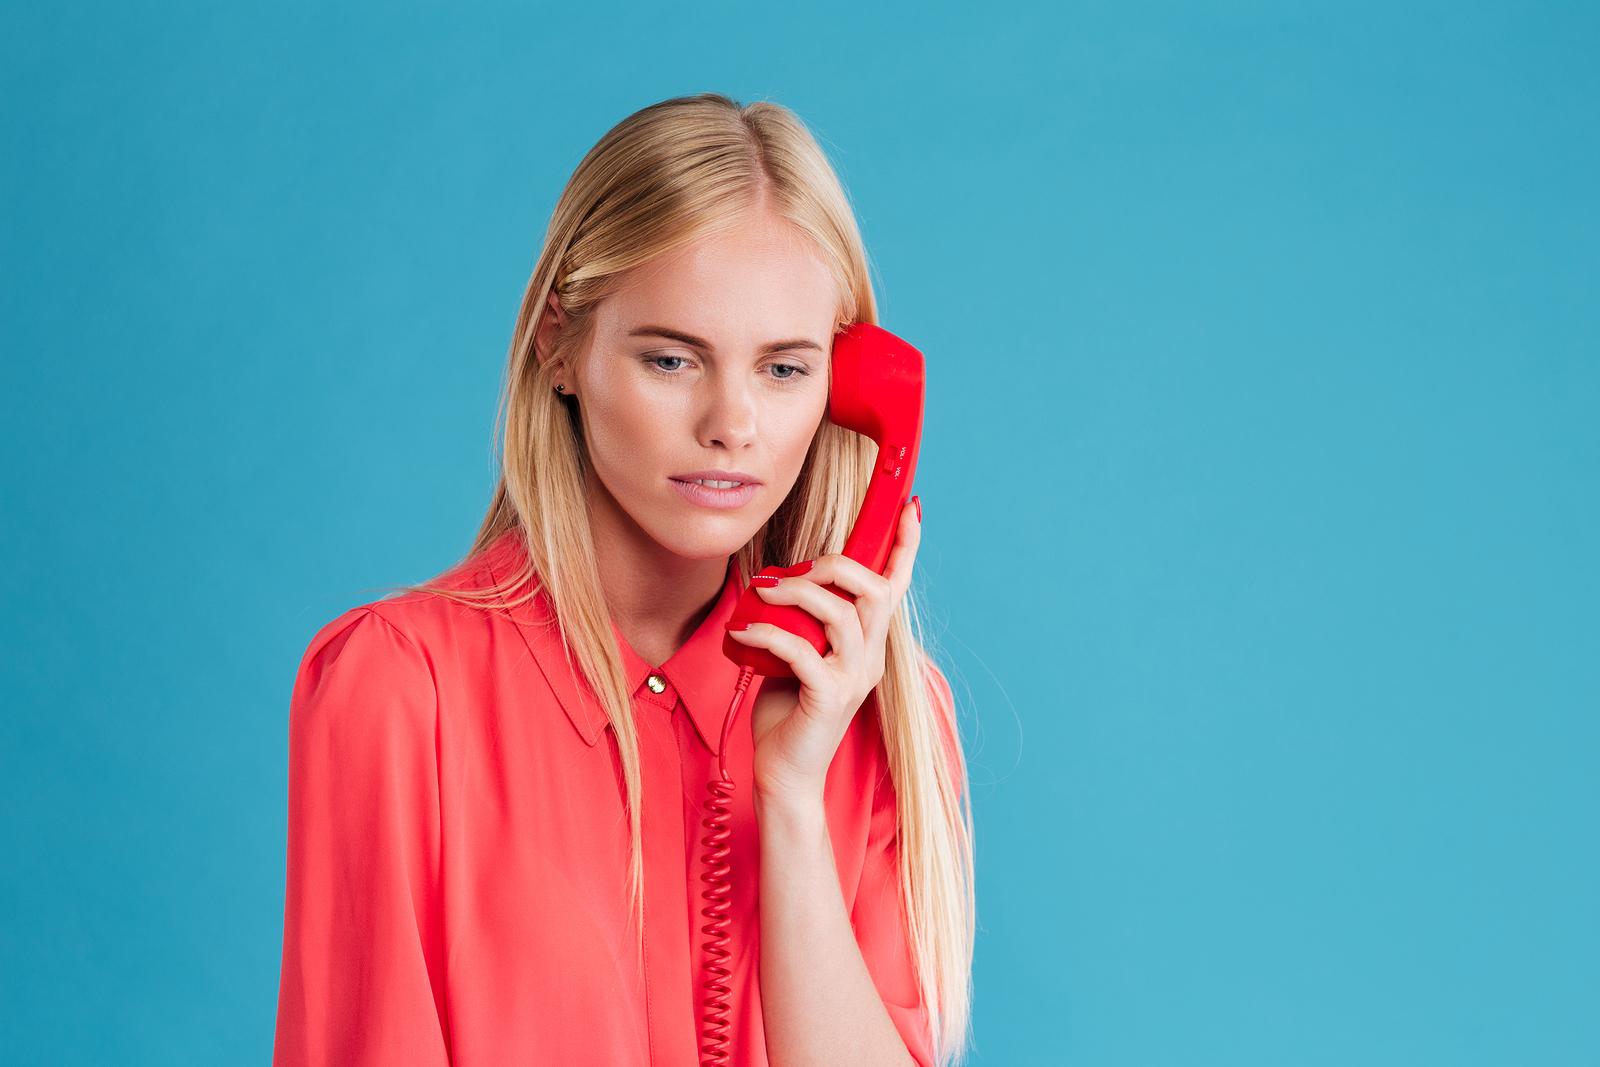 Sad blonde woman holding phone tube isolated on a blue background